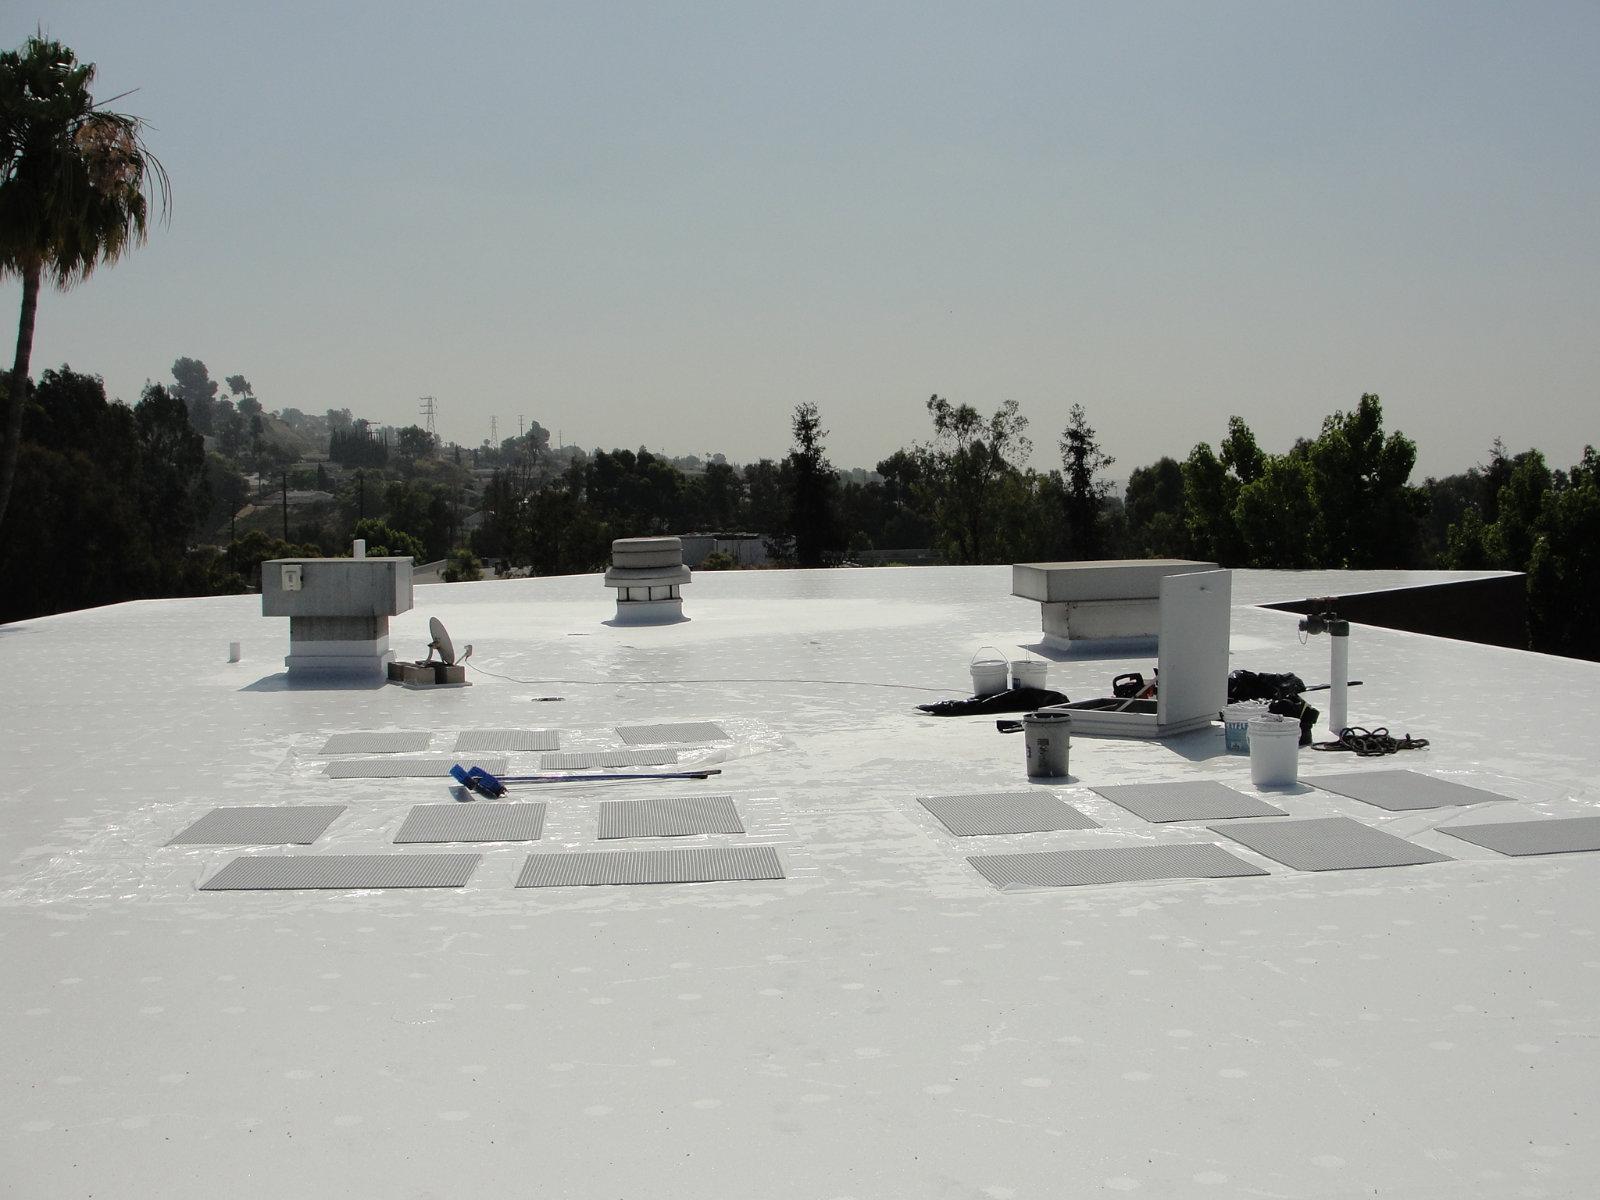 AcryShield Roof Coatings